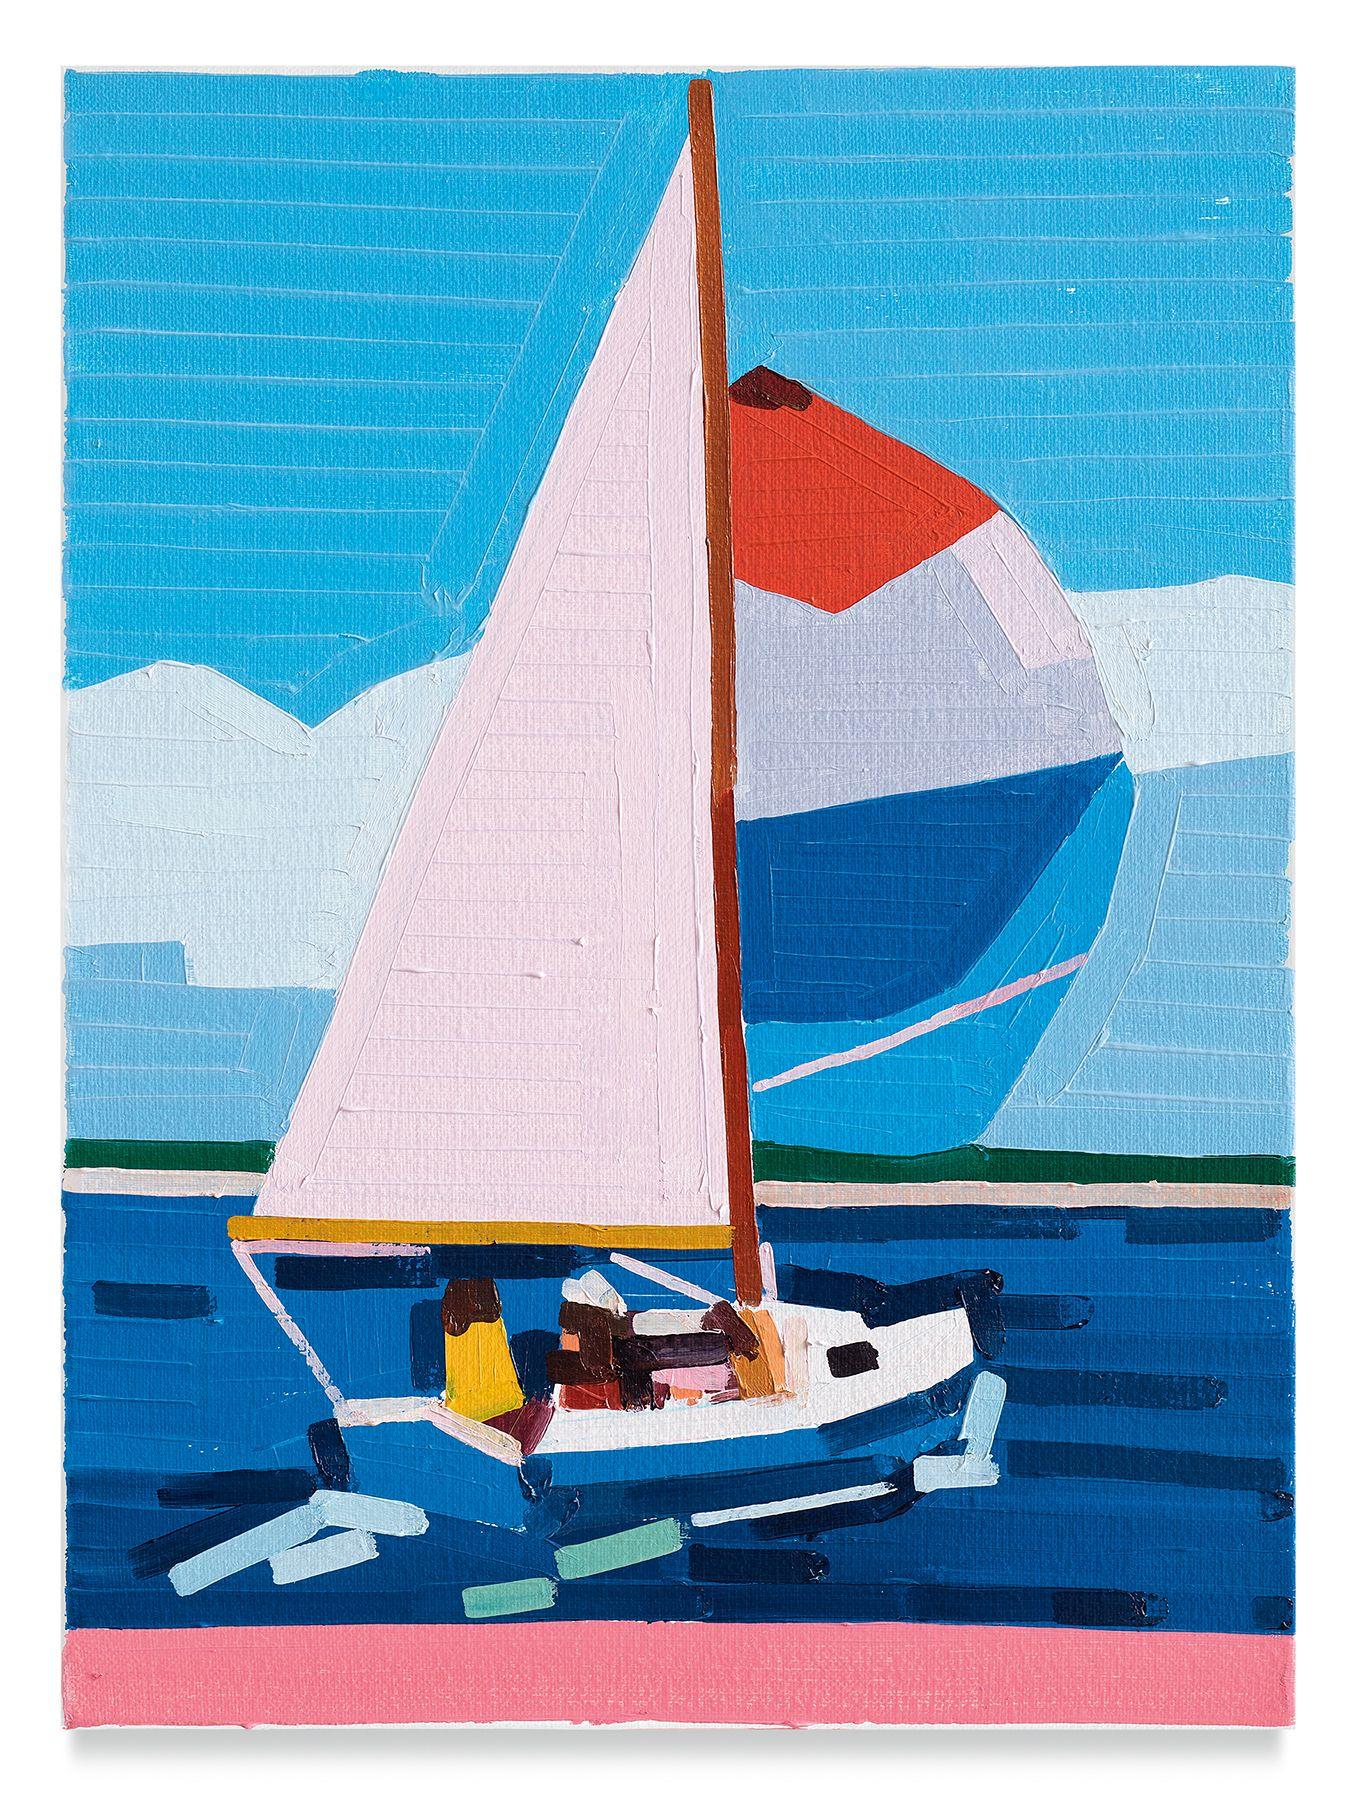 Guy Yanai, Sailing East, 2019